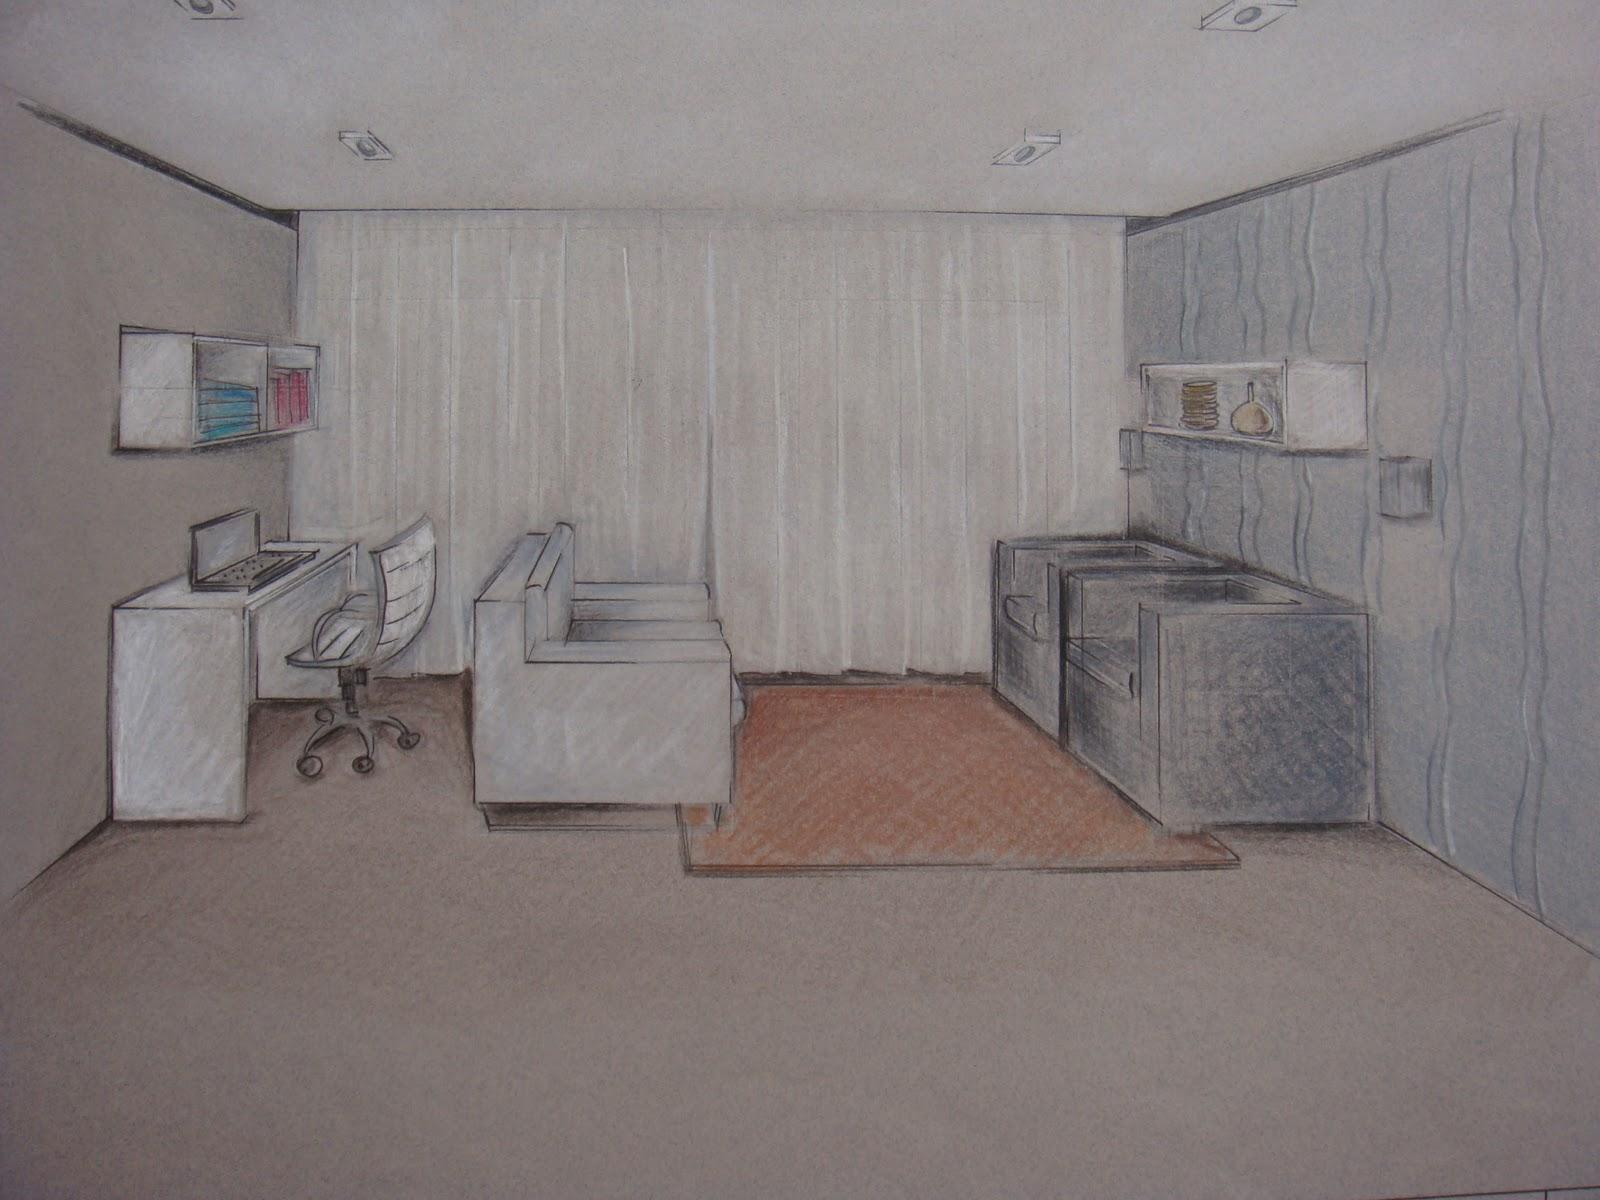 Design de interiores apartamento zona oeste s o paulo for Diseno de interiores zona oeste